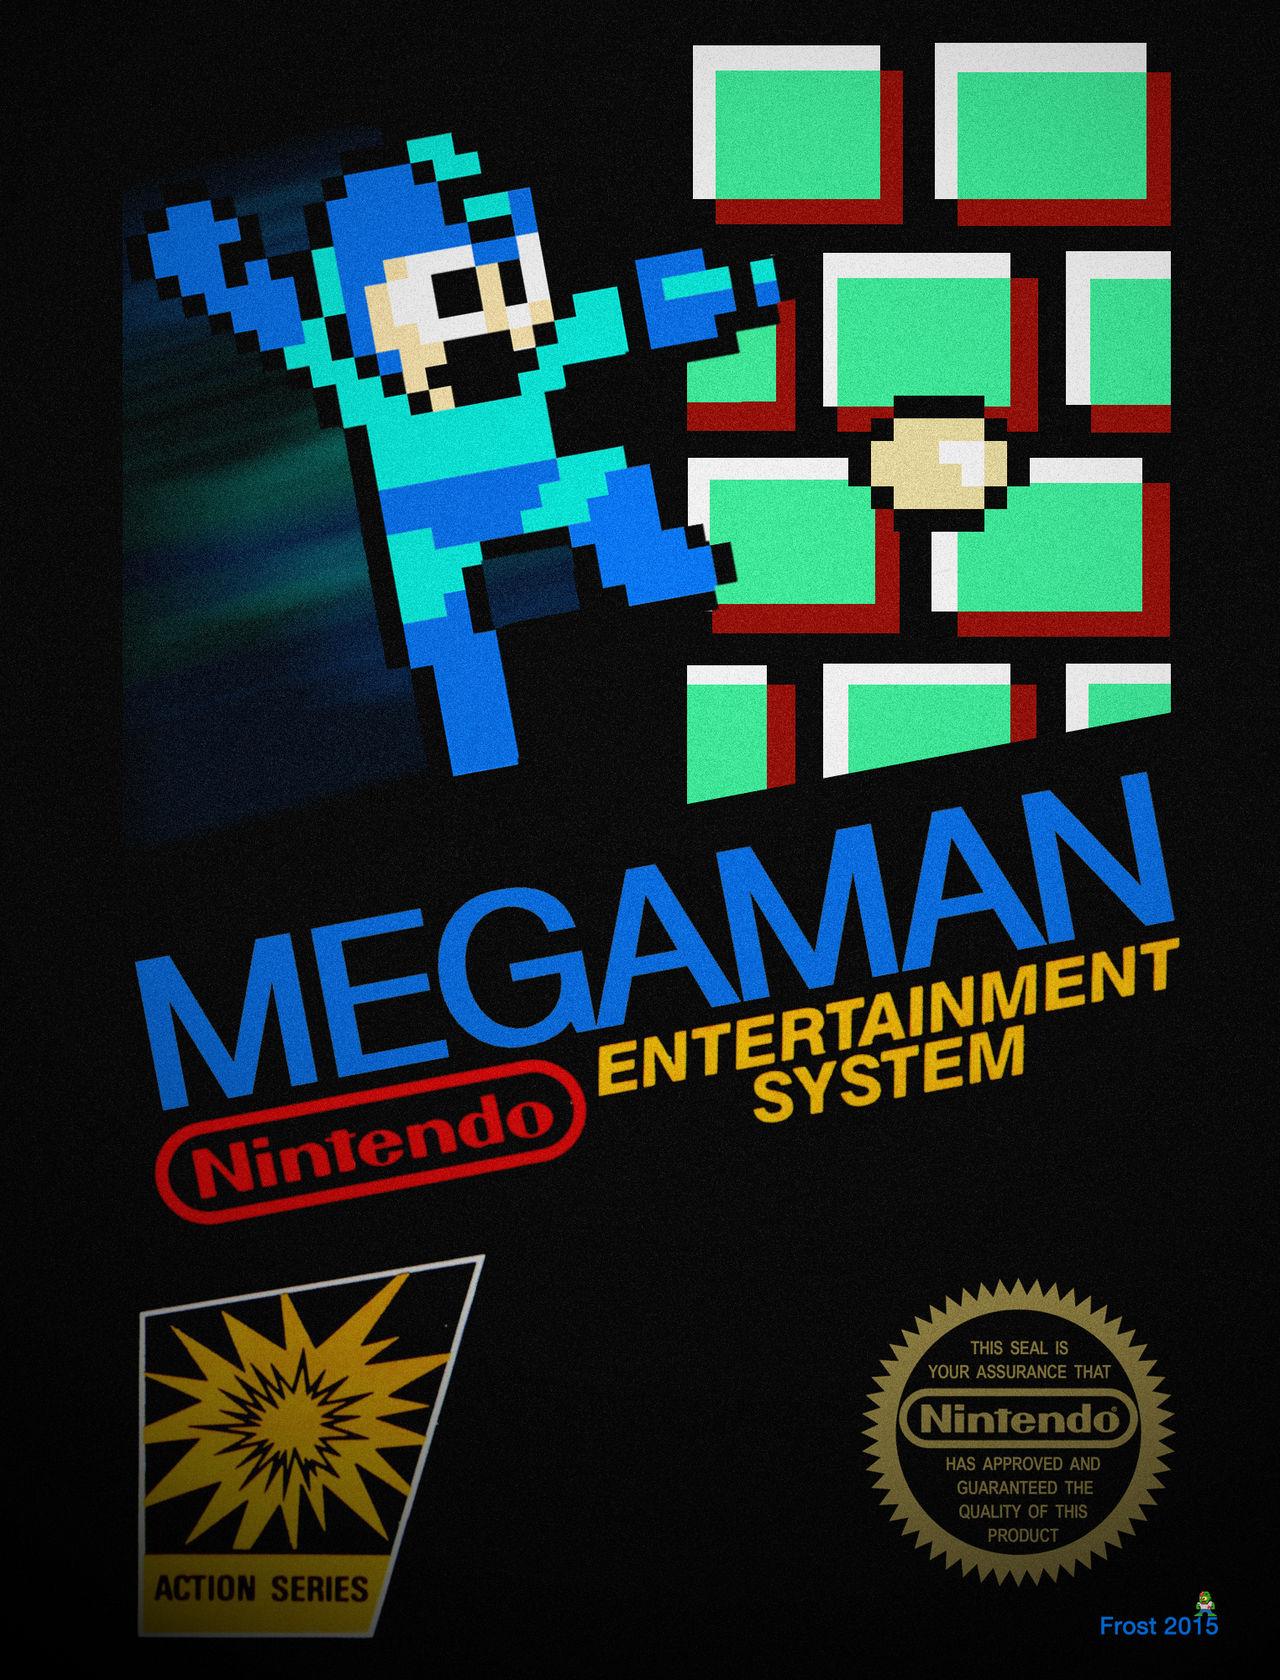 Megaman Cover